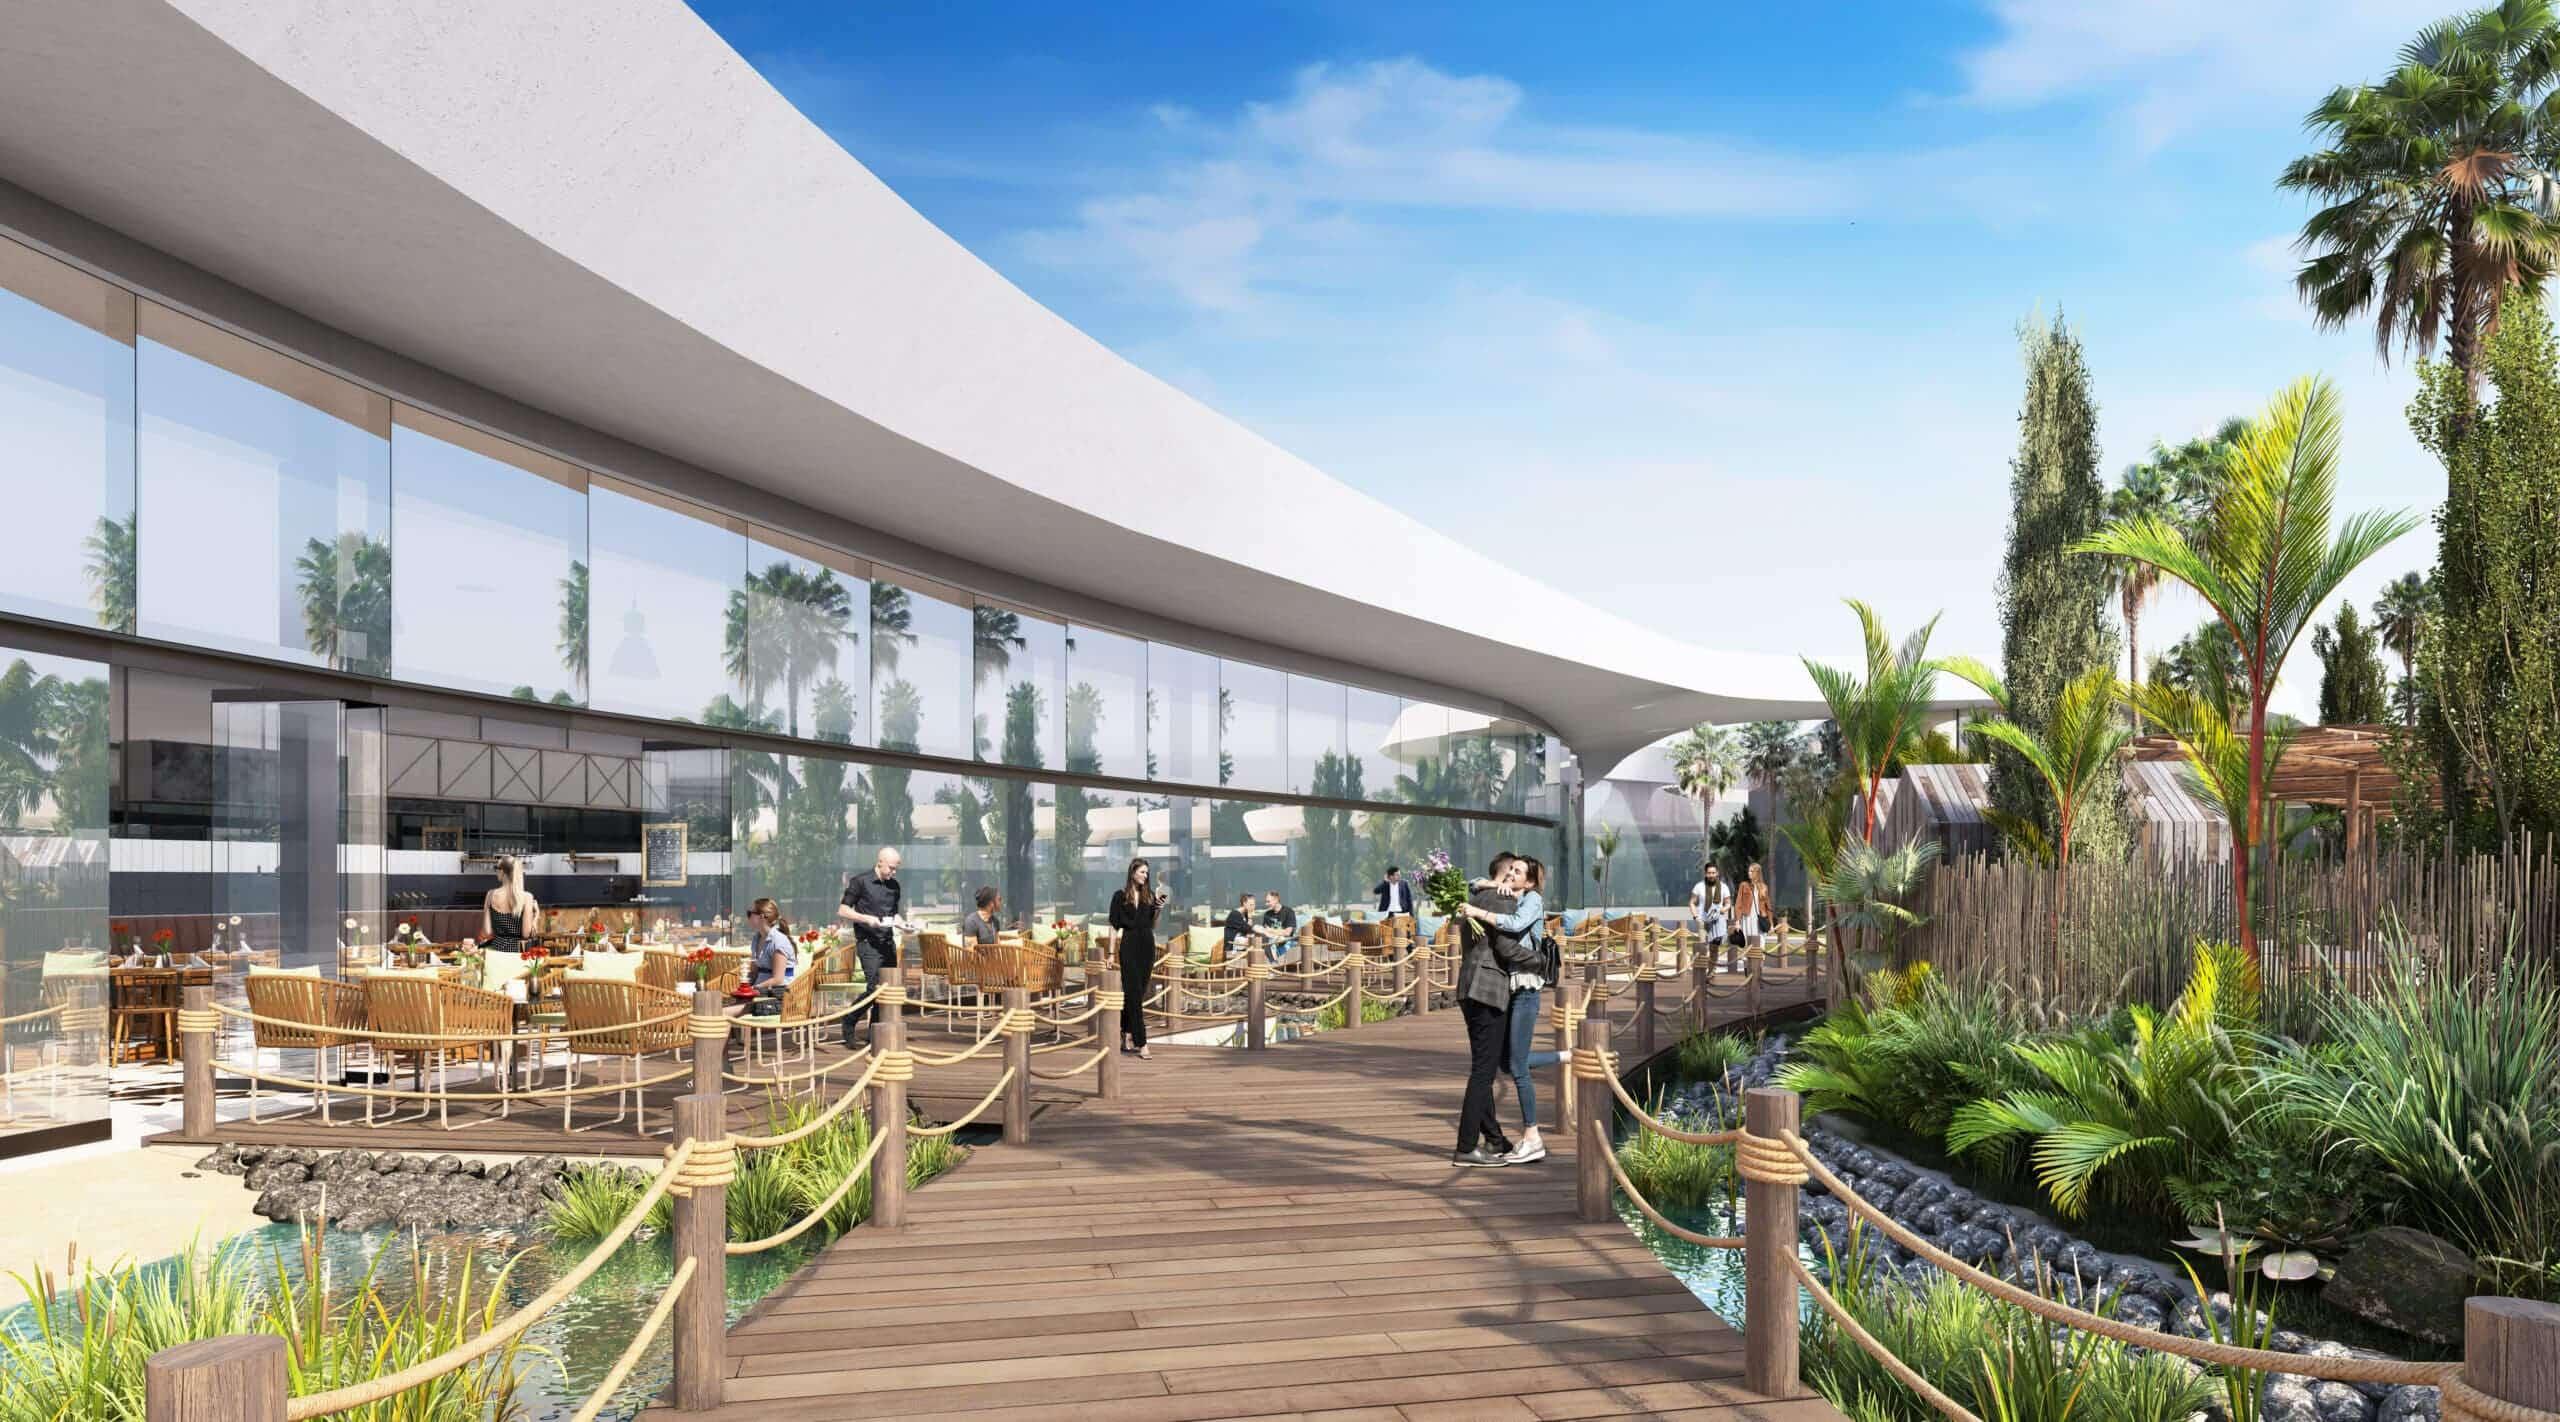 Oasiz Madrid será un nuevo resort comercial estilo Dubai